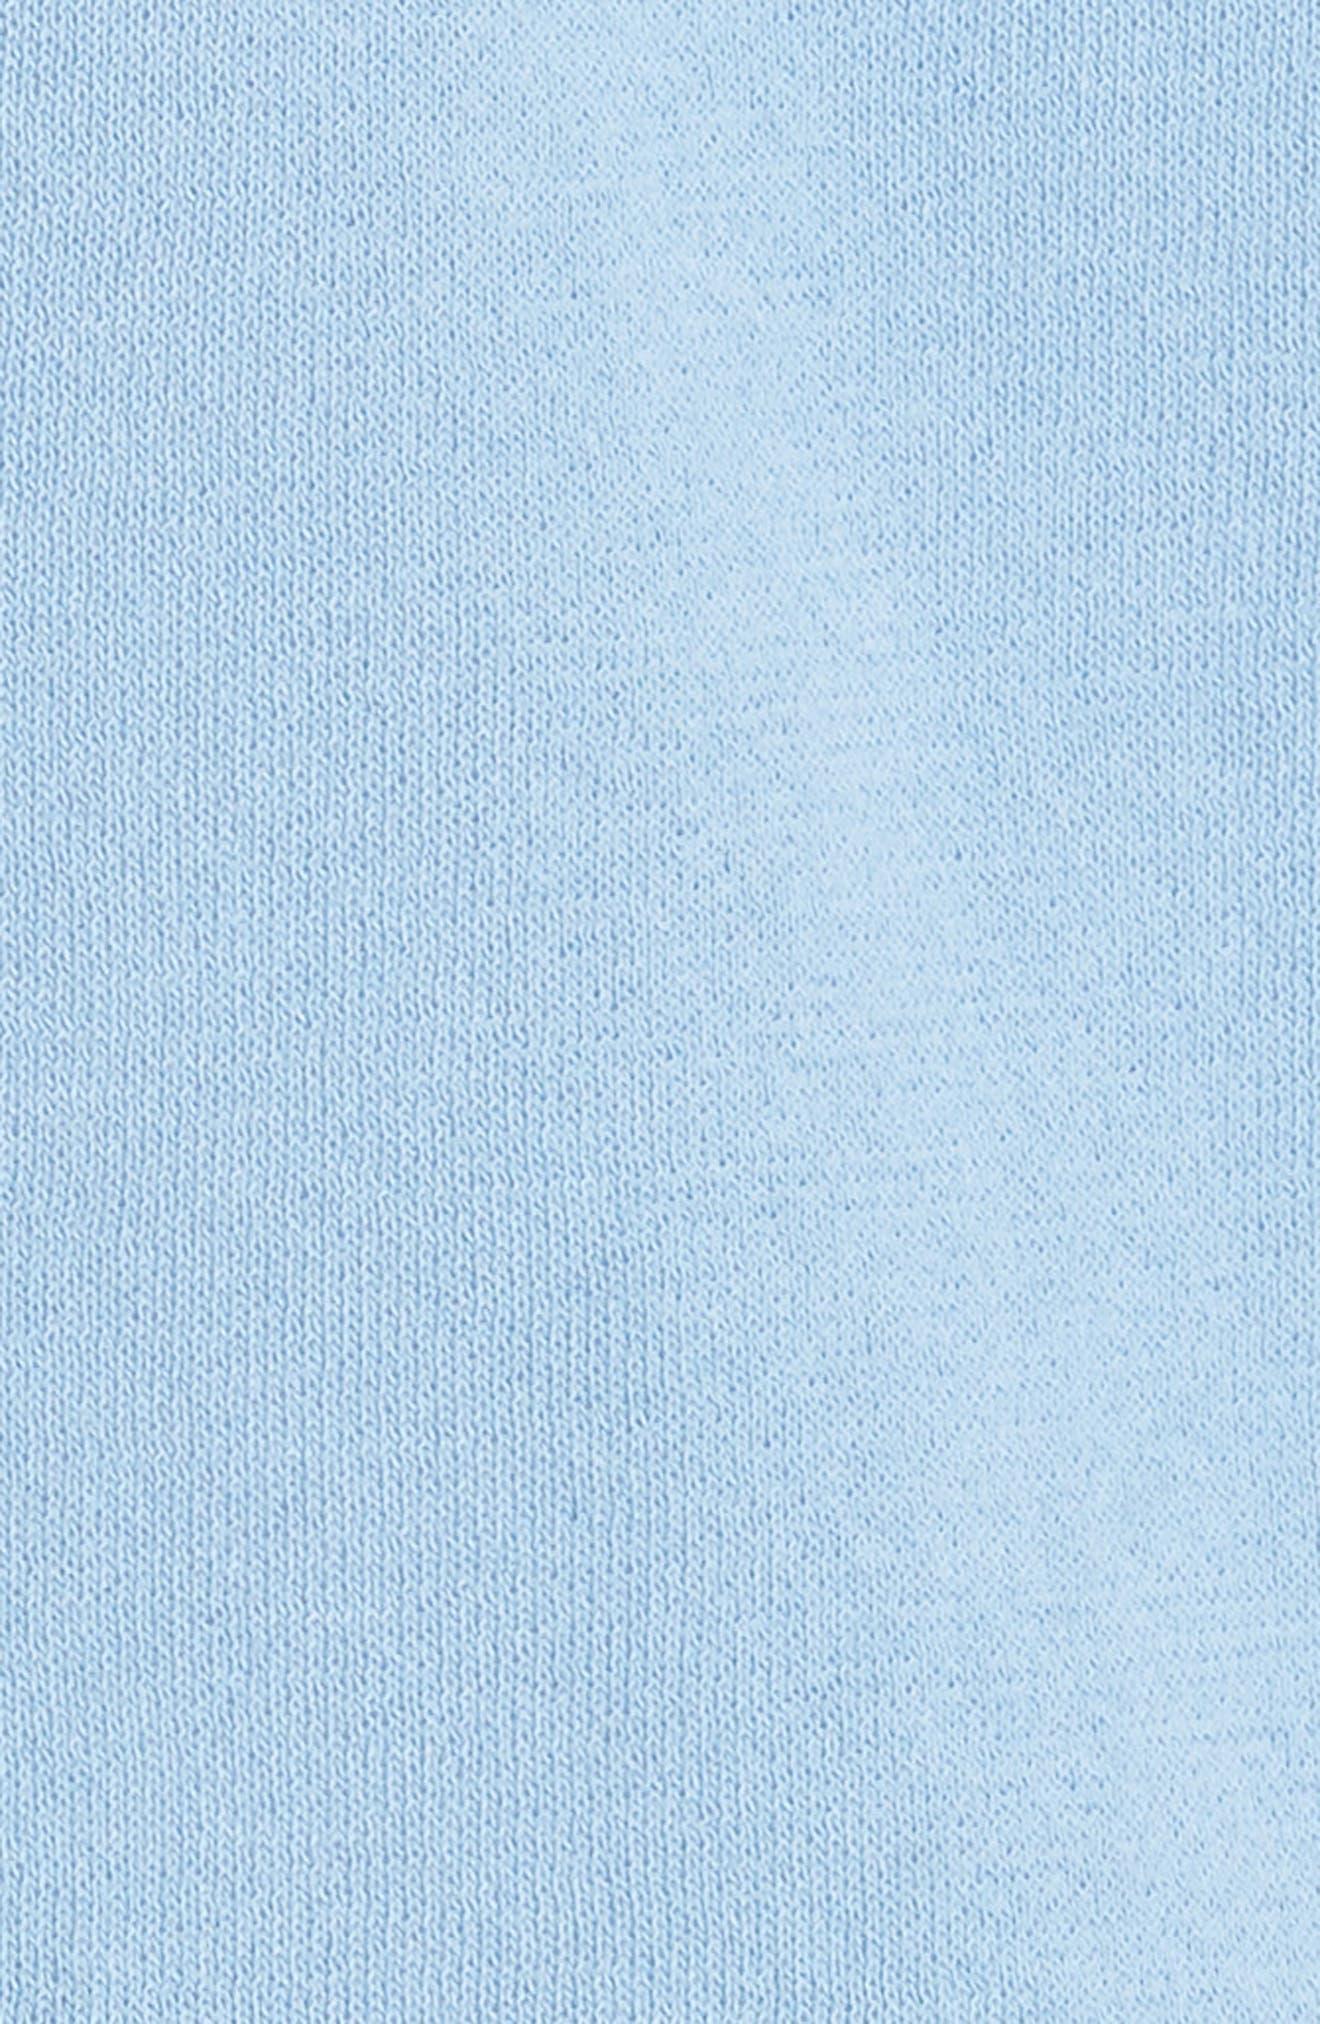 Diane von Furstenberg Colorblock Stripe Cardigan,                             Alternate thumbnail 5, color,                             Taffy Multi